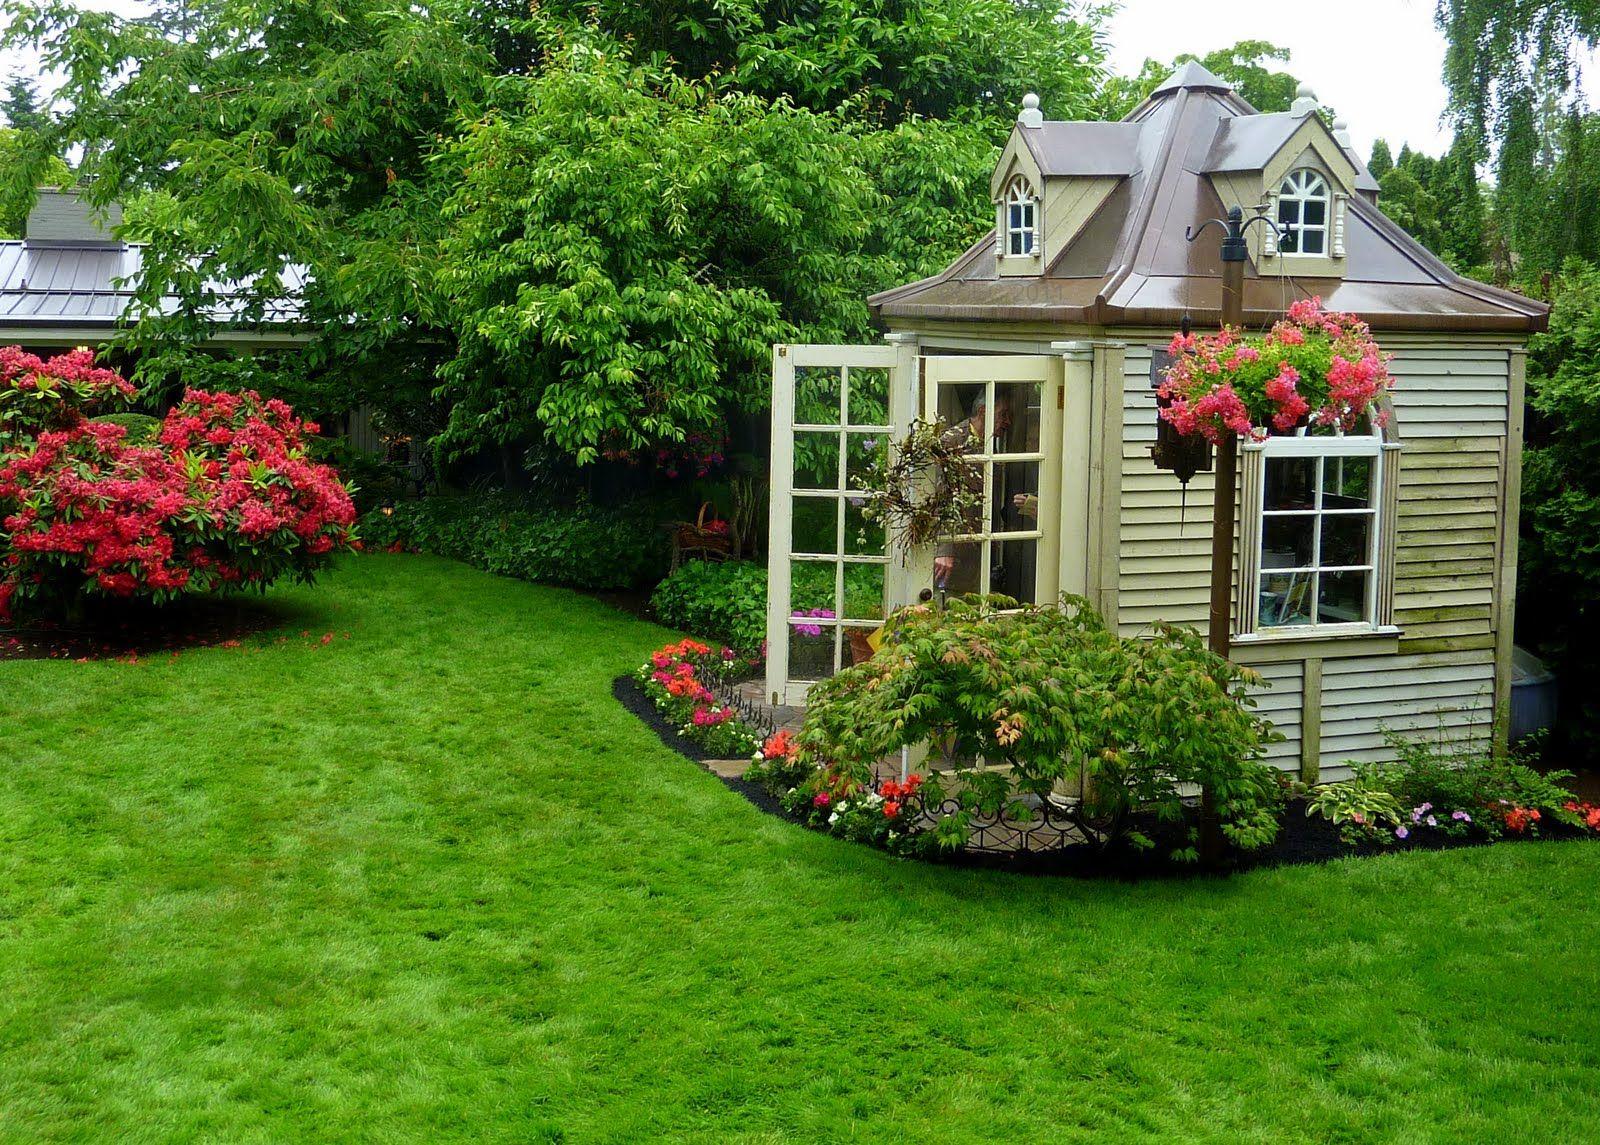 Delicieux Impressive Garden House Small Garden Shed Design Ideas